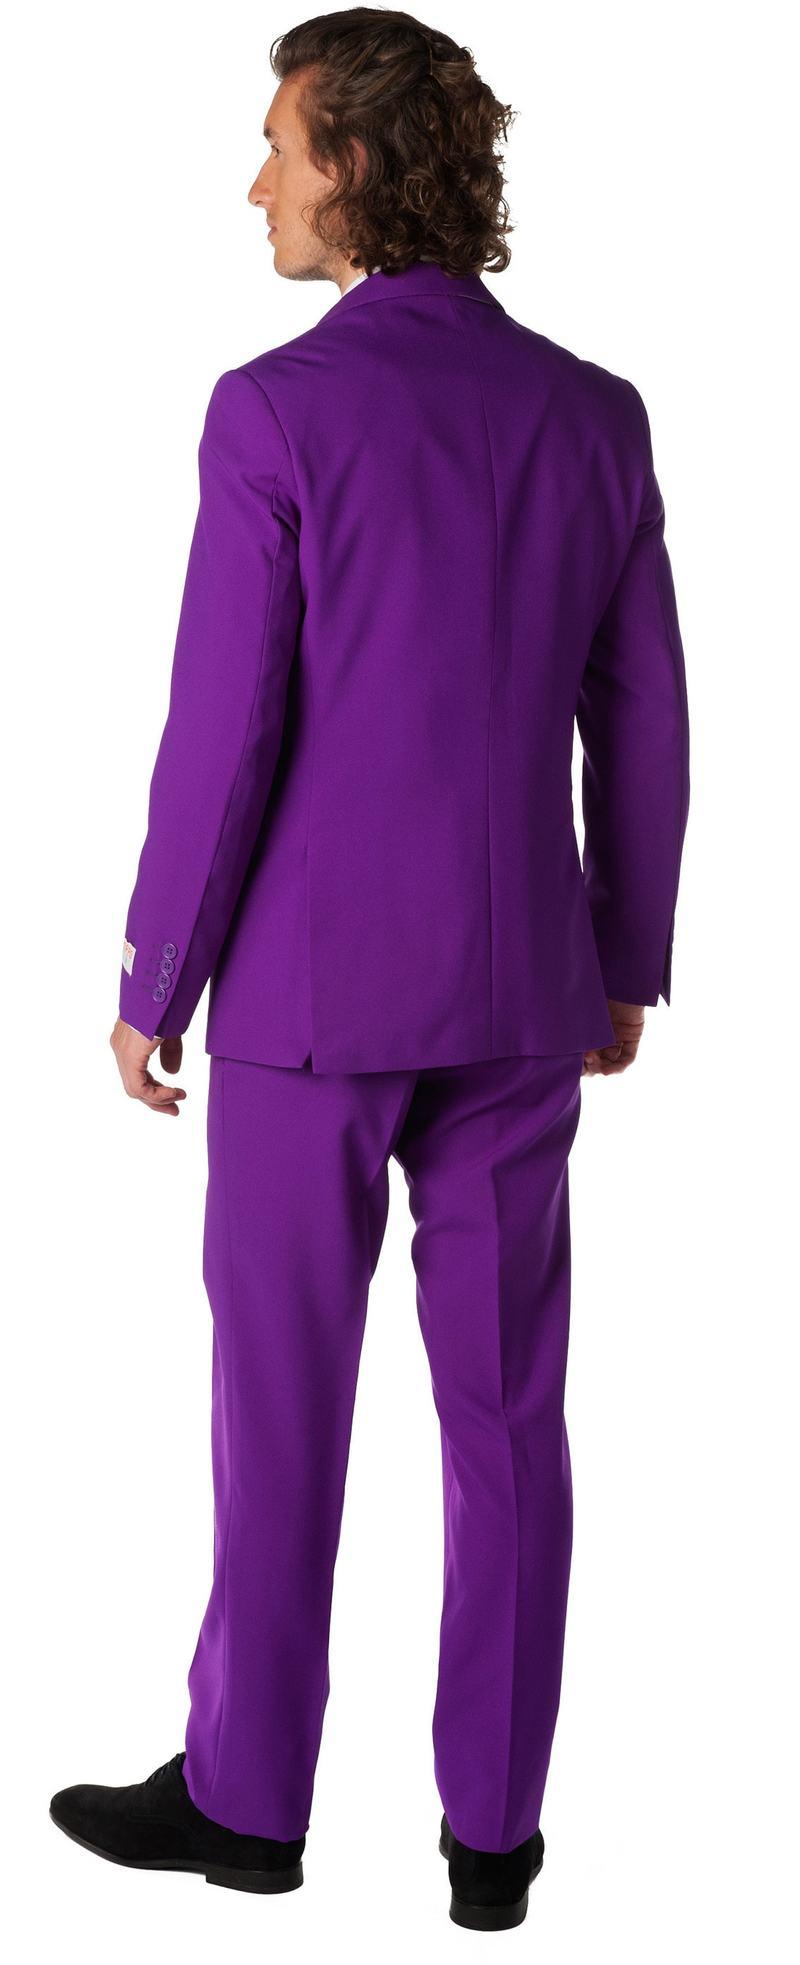 OppoSuits Purple Prince Kostuum foto 1